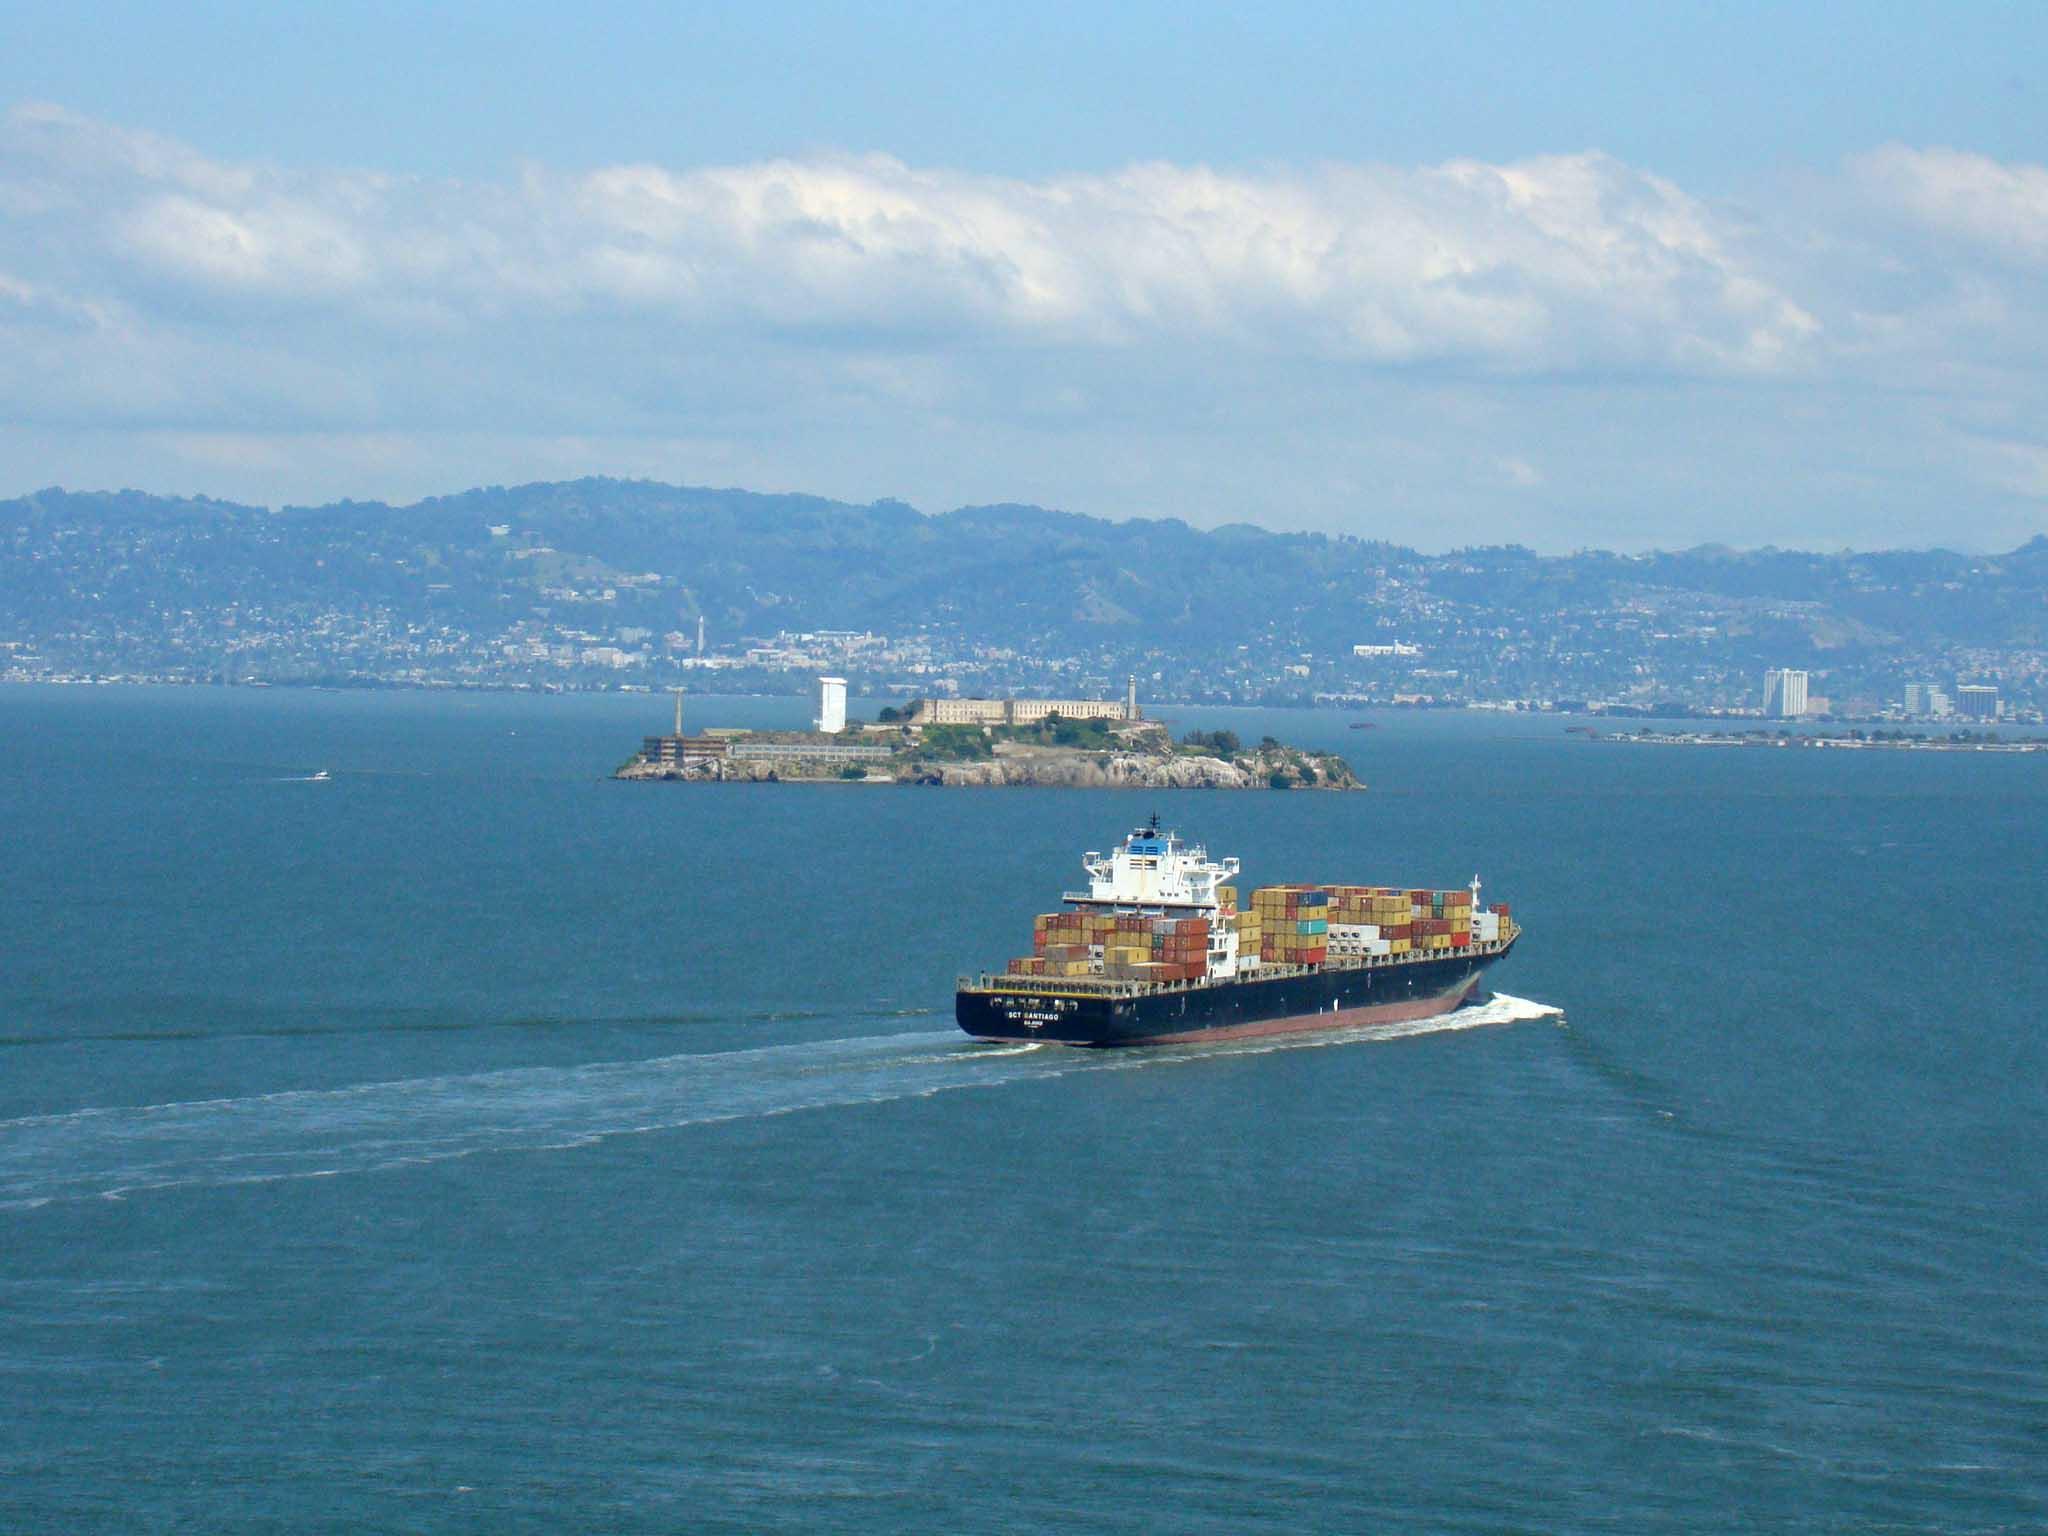 Alcatraz vista do alto da Golden Gate